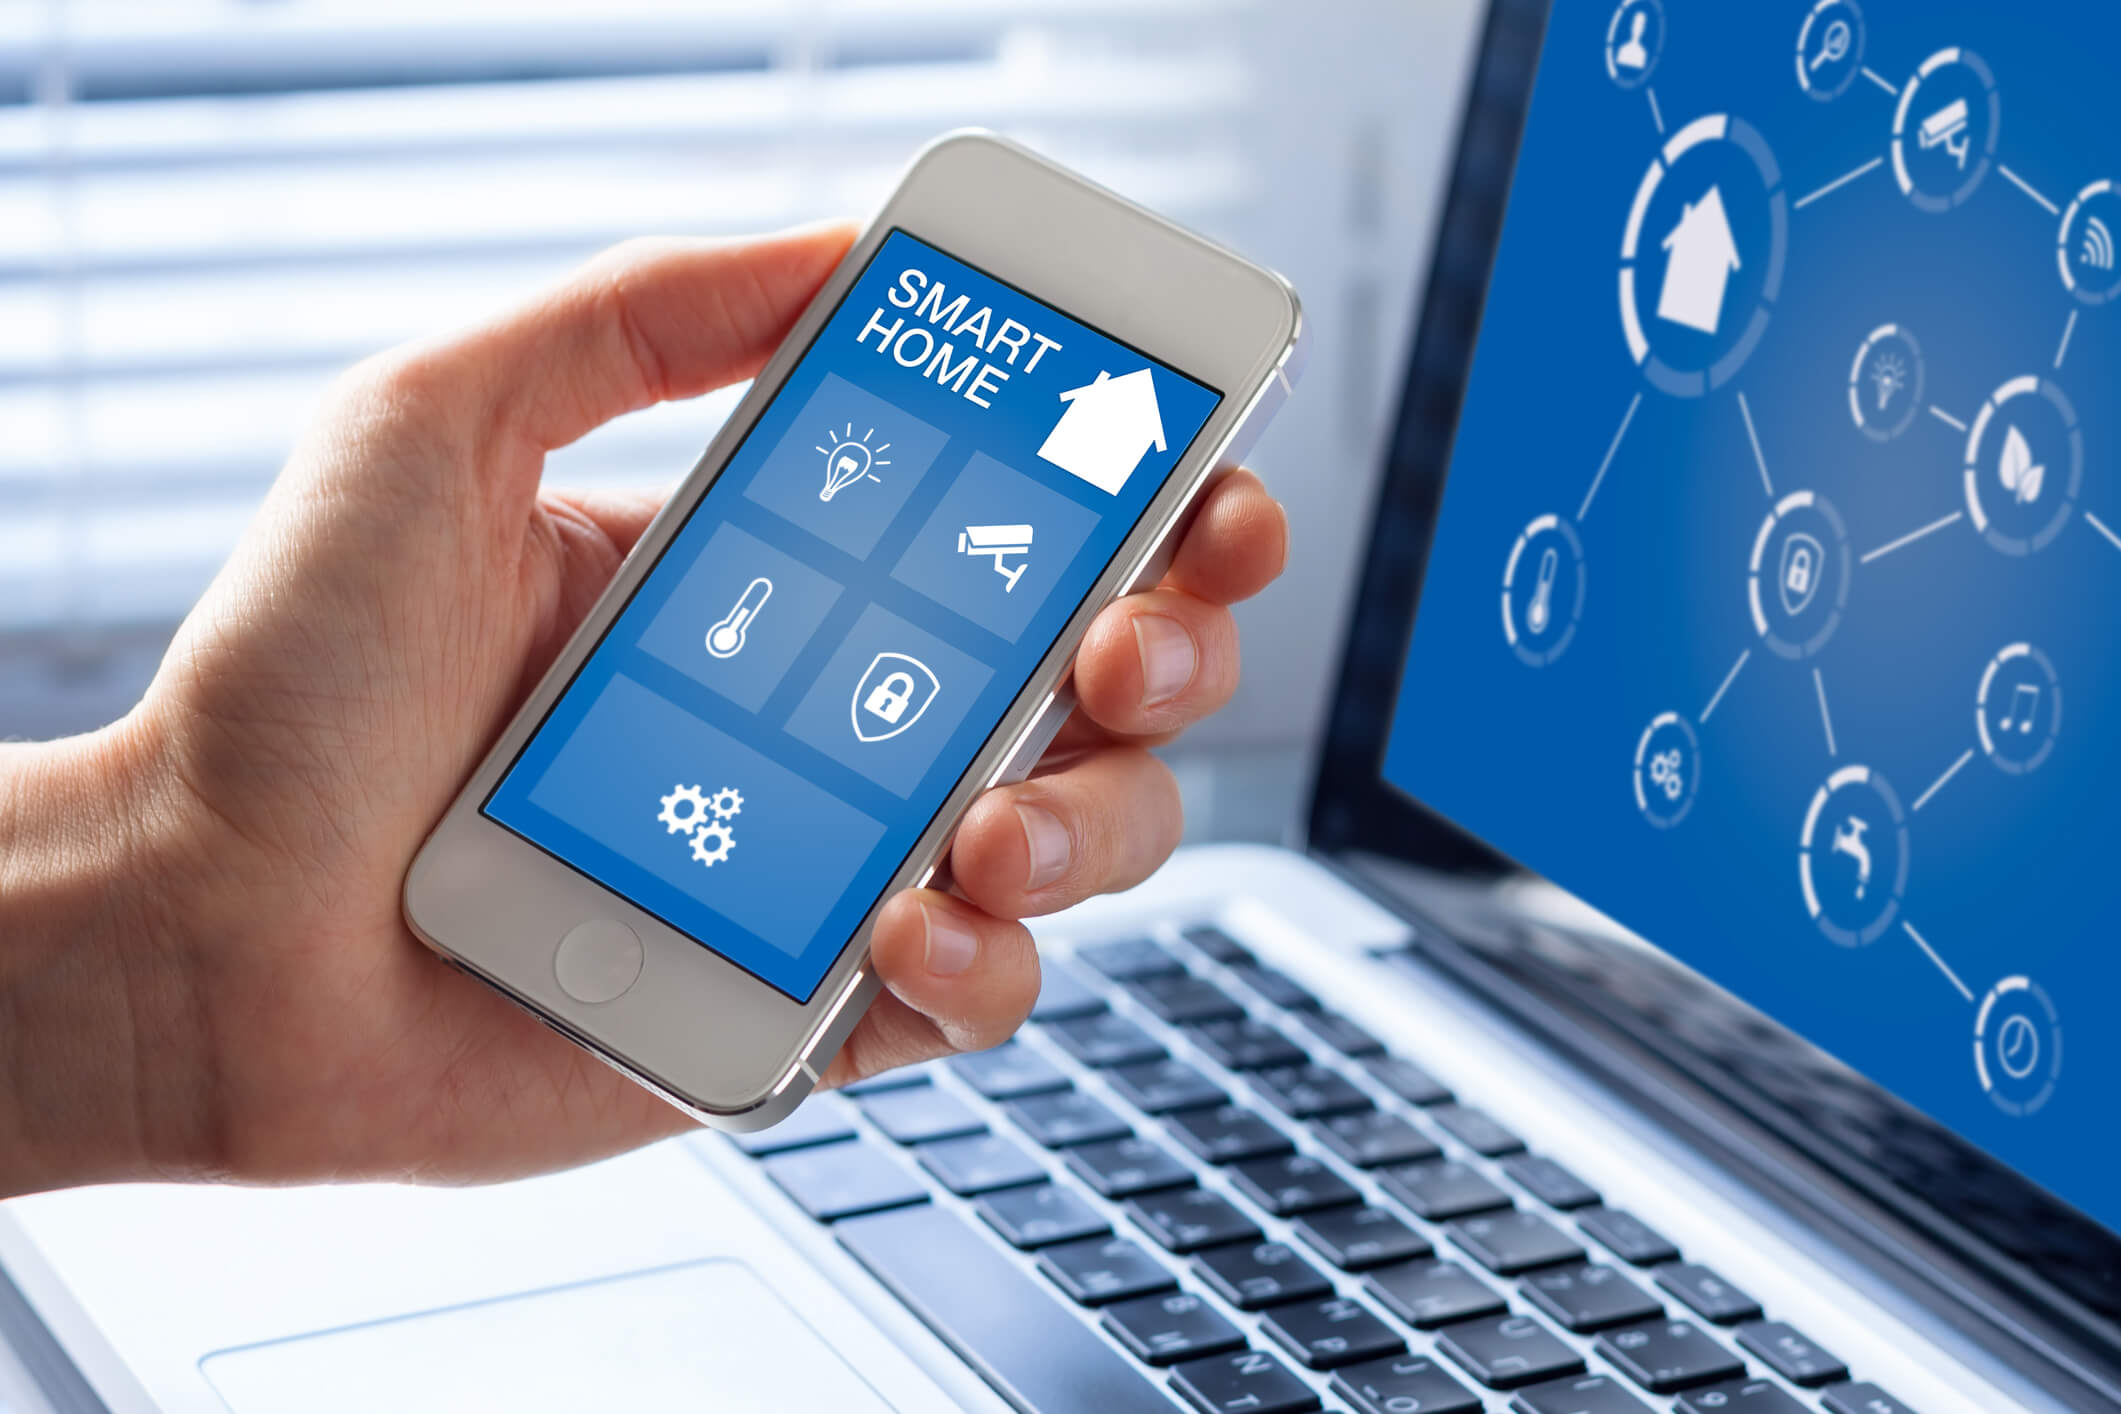 smart-home-security-c.jpg